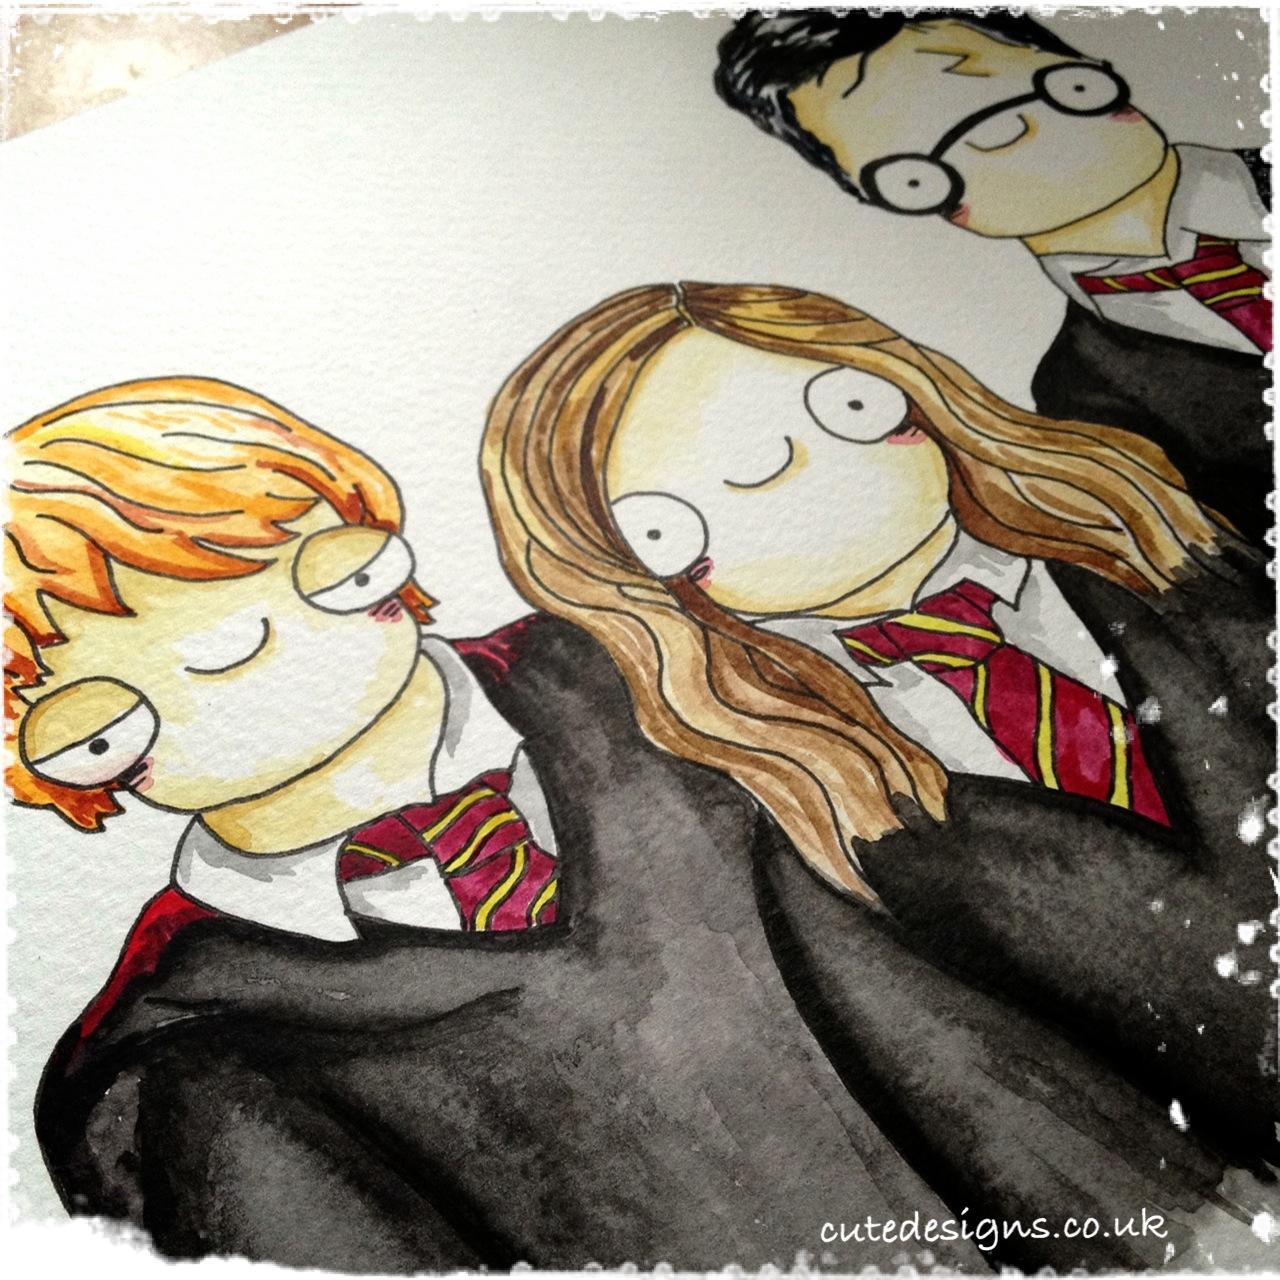 Cute Designs Uk Amigurumi Kawaii And Plush Love Harry